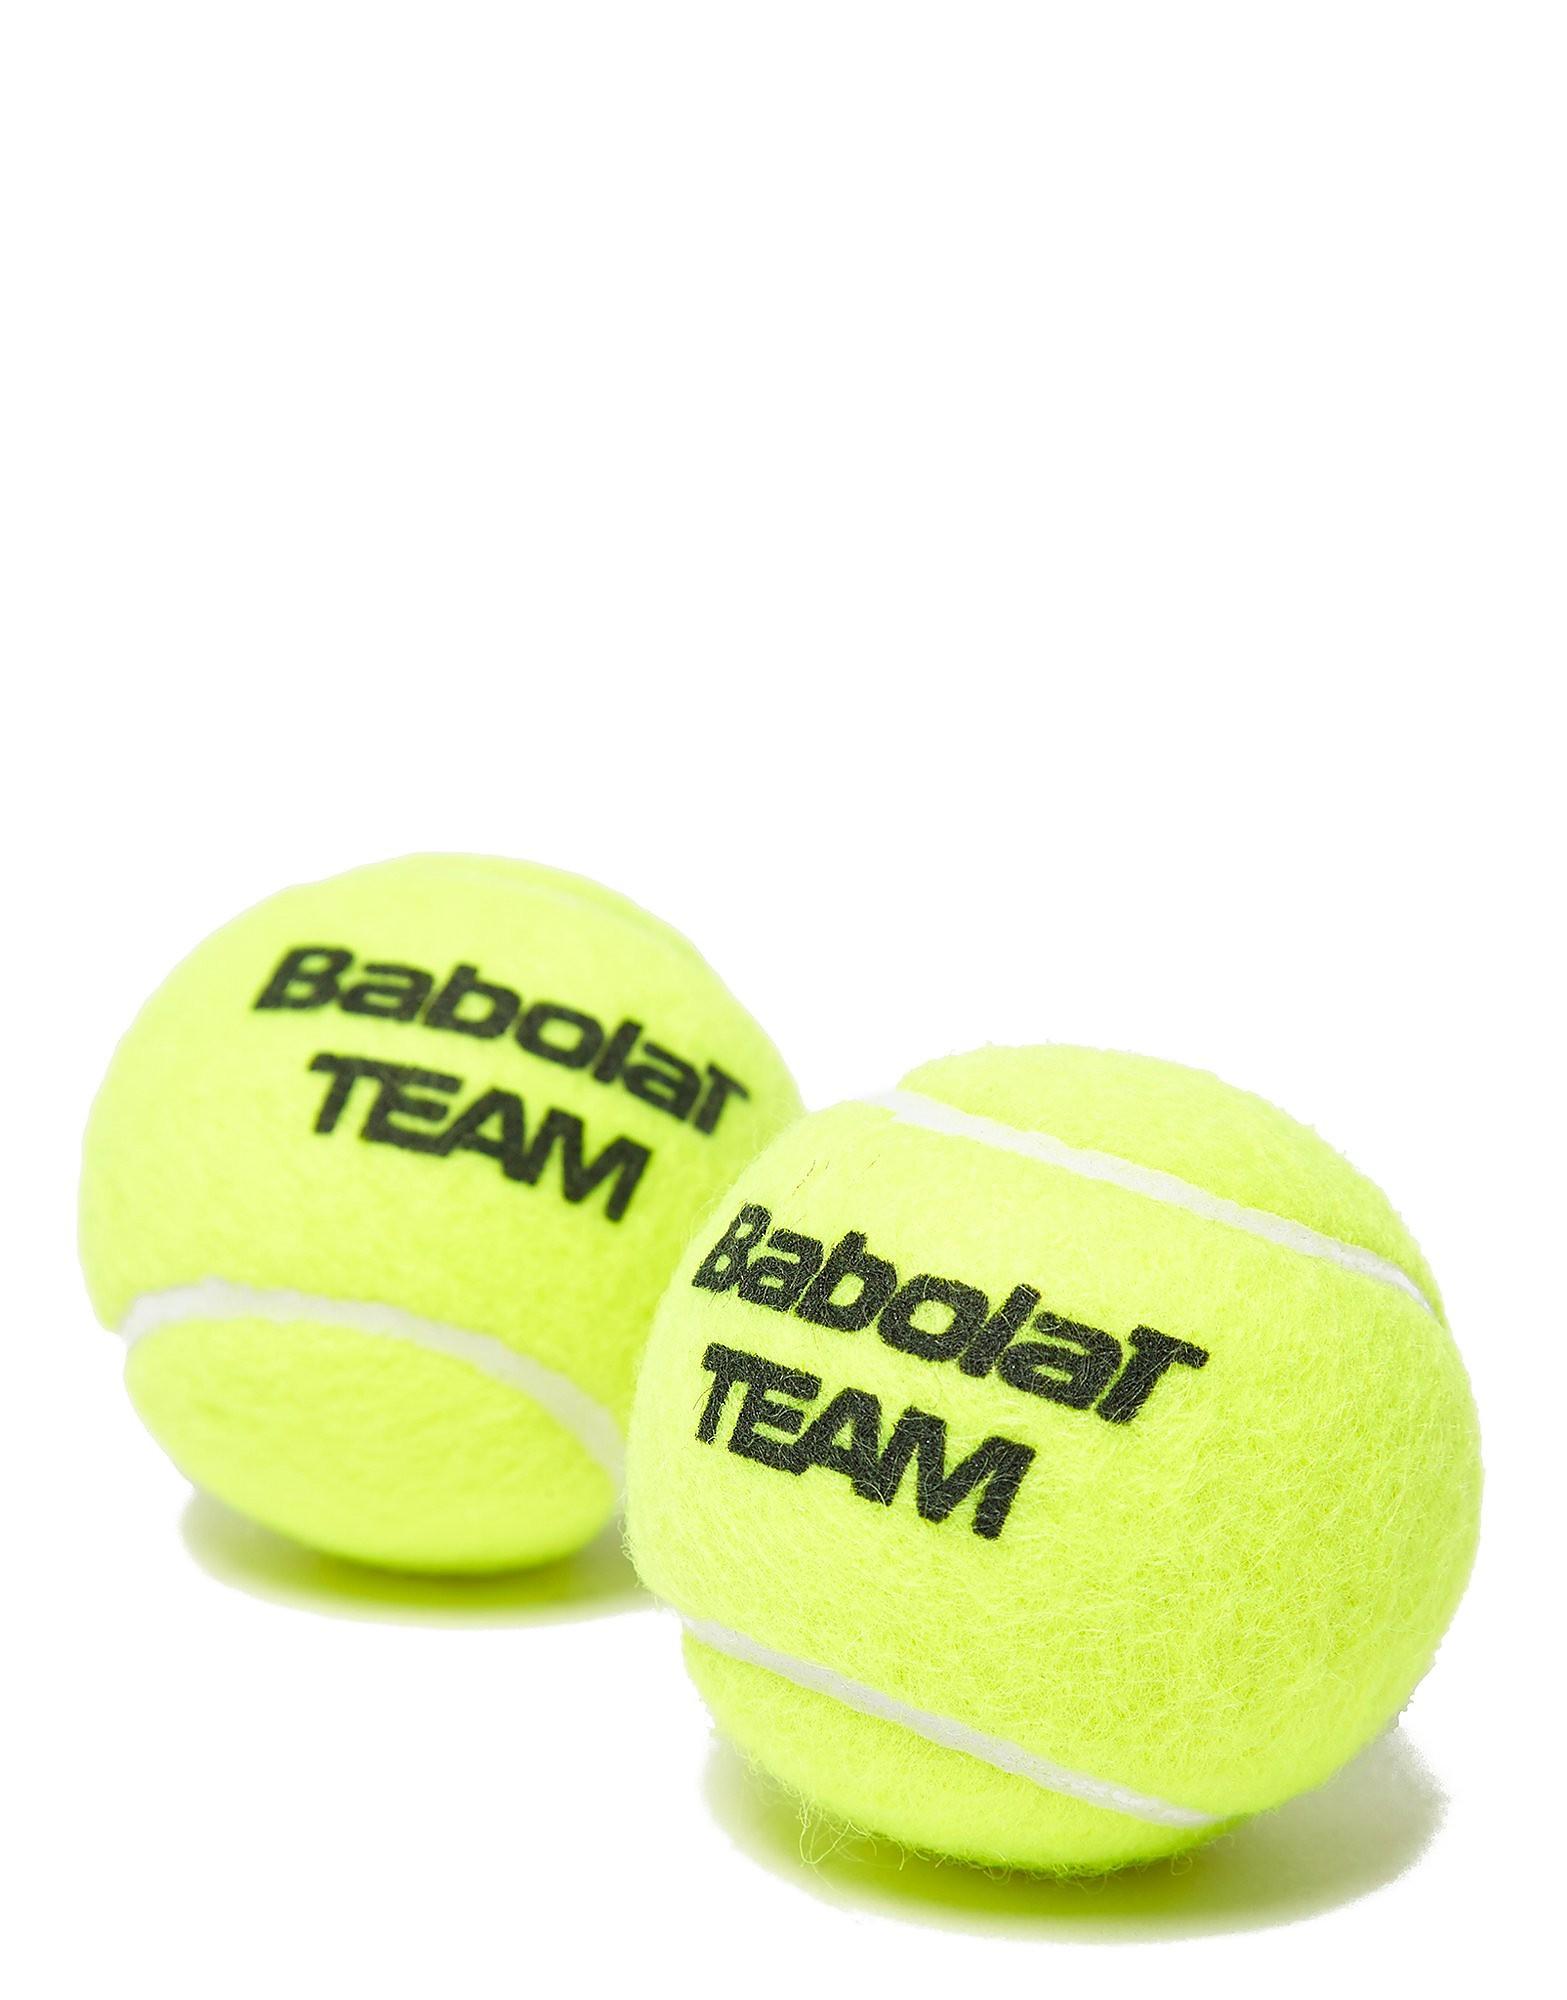 Babolat Team Tennis Balls (4 can)